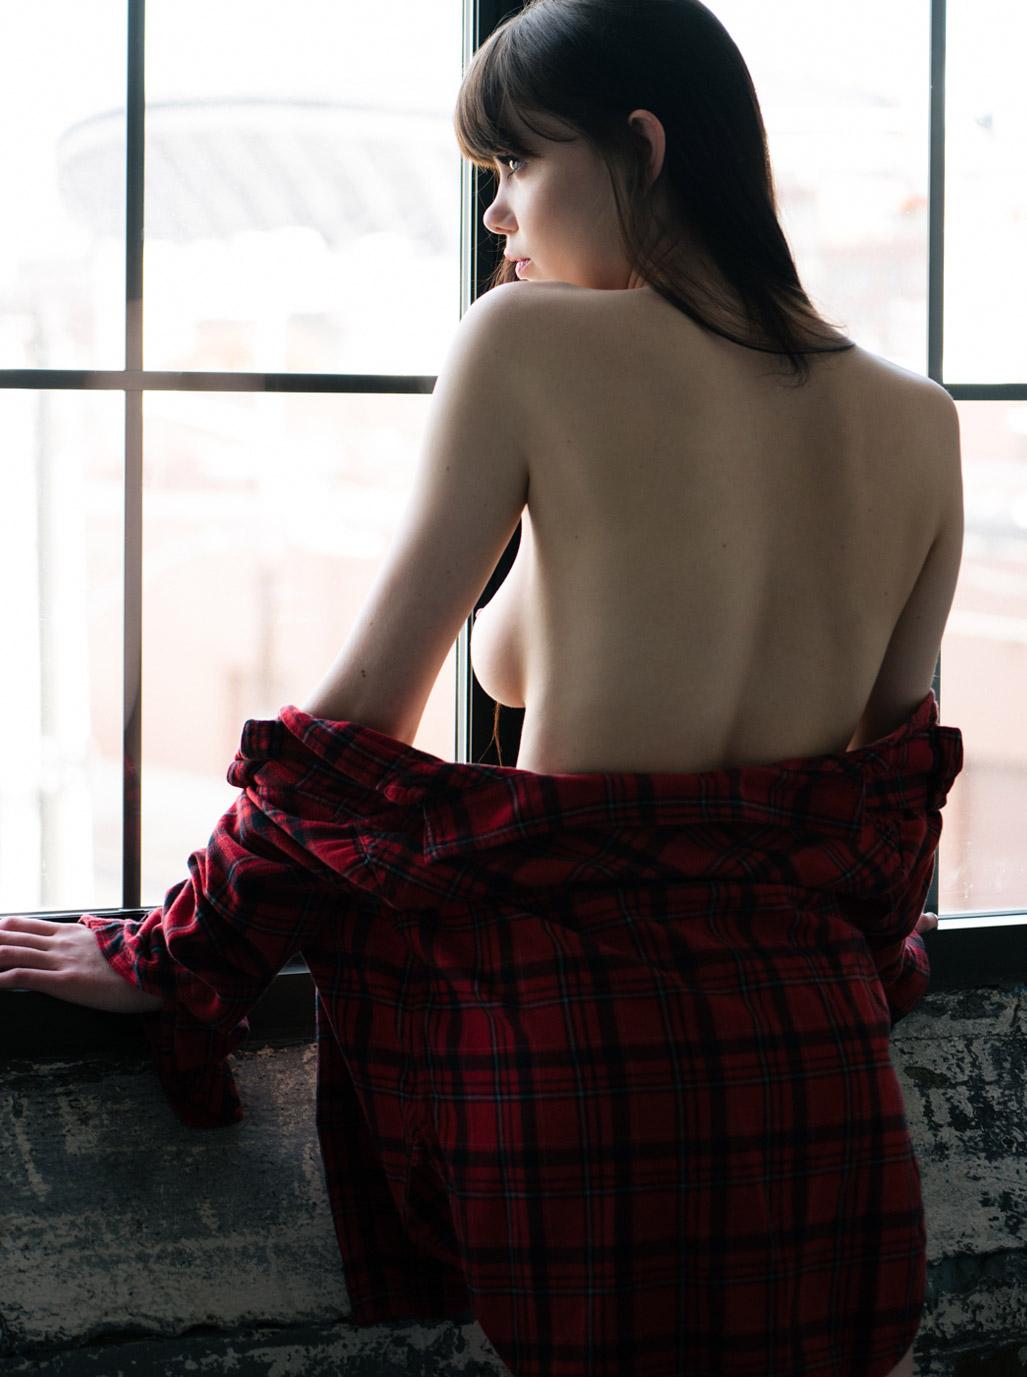 когда на улице дождь - Айленд Роуз / Ireland Rose nude by Mark Hanson - Lions Magazine